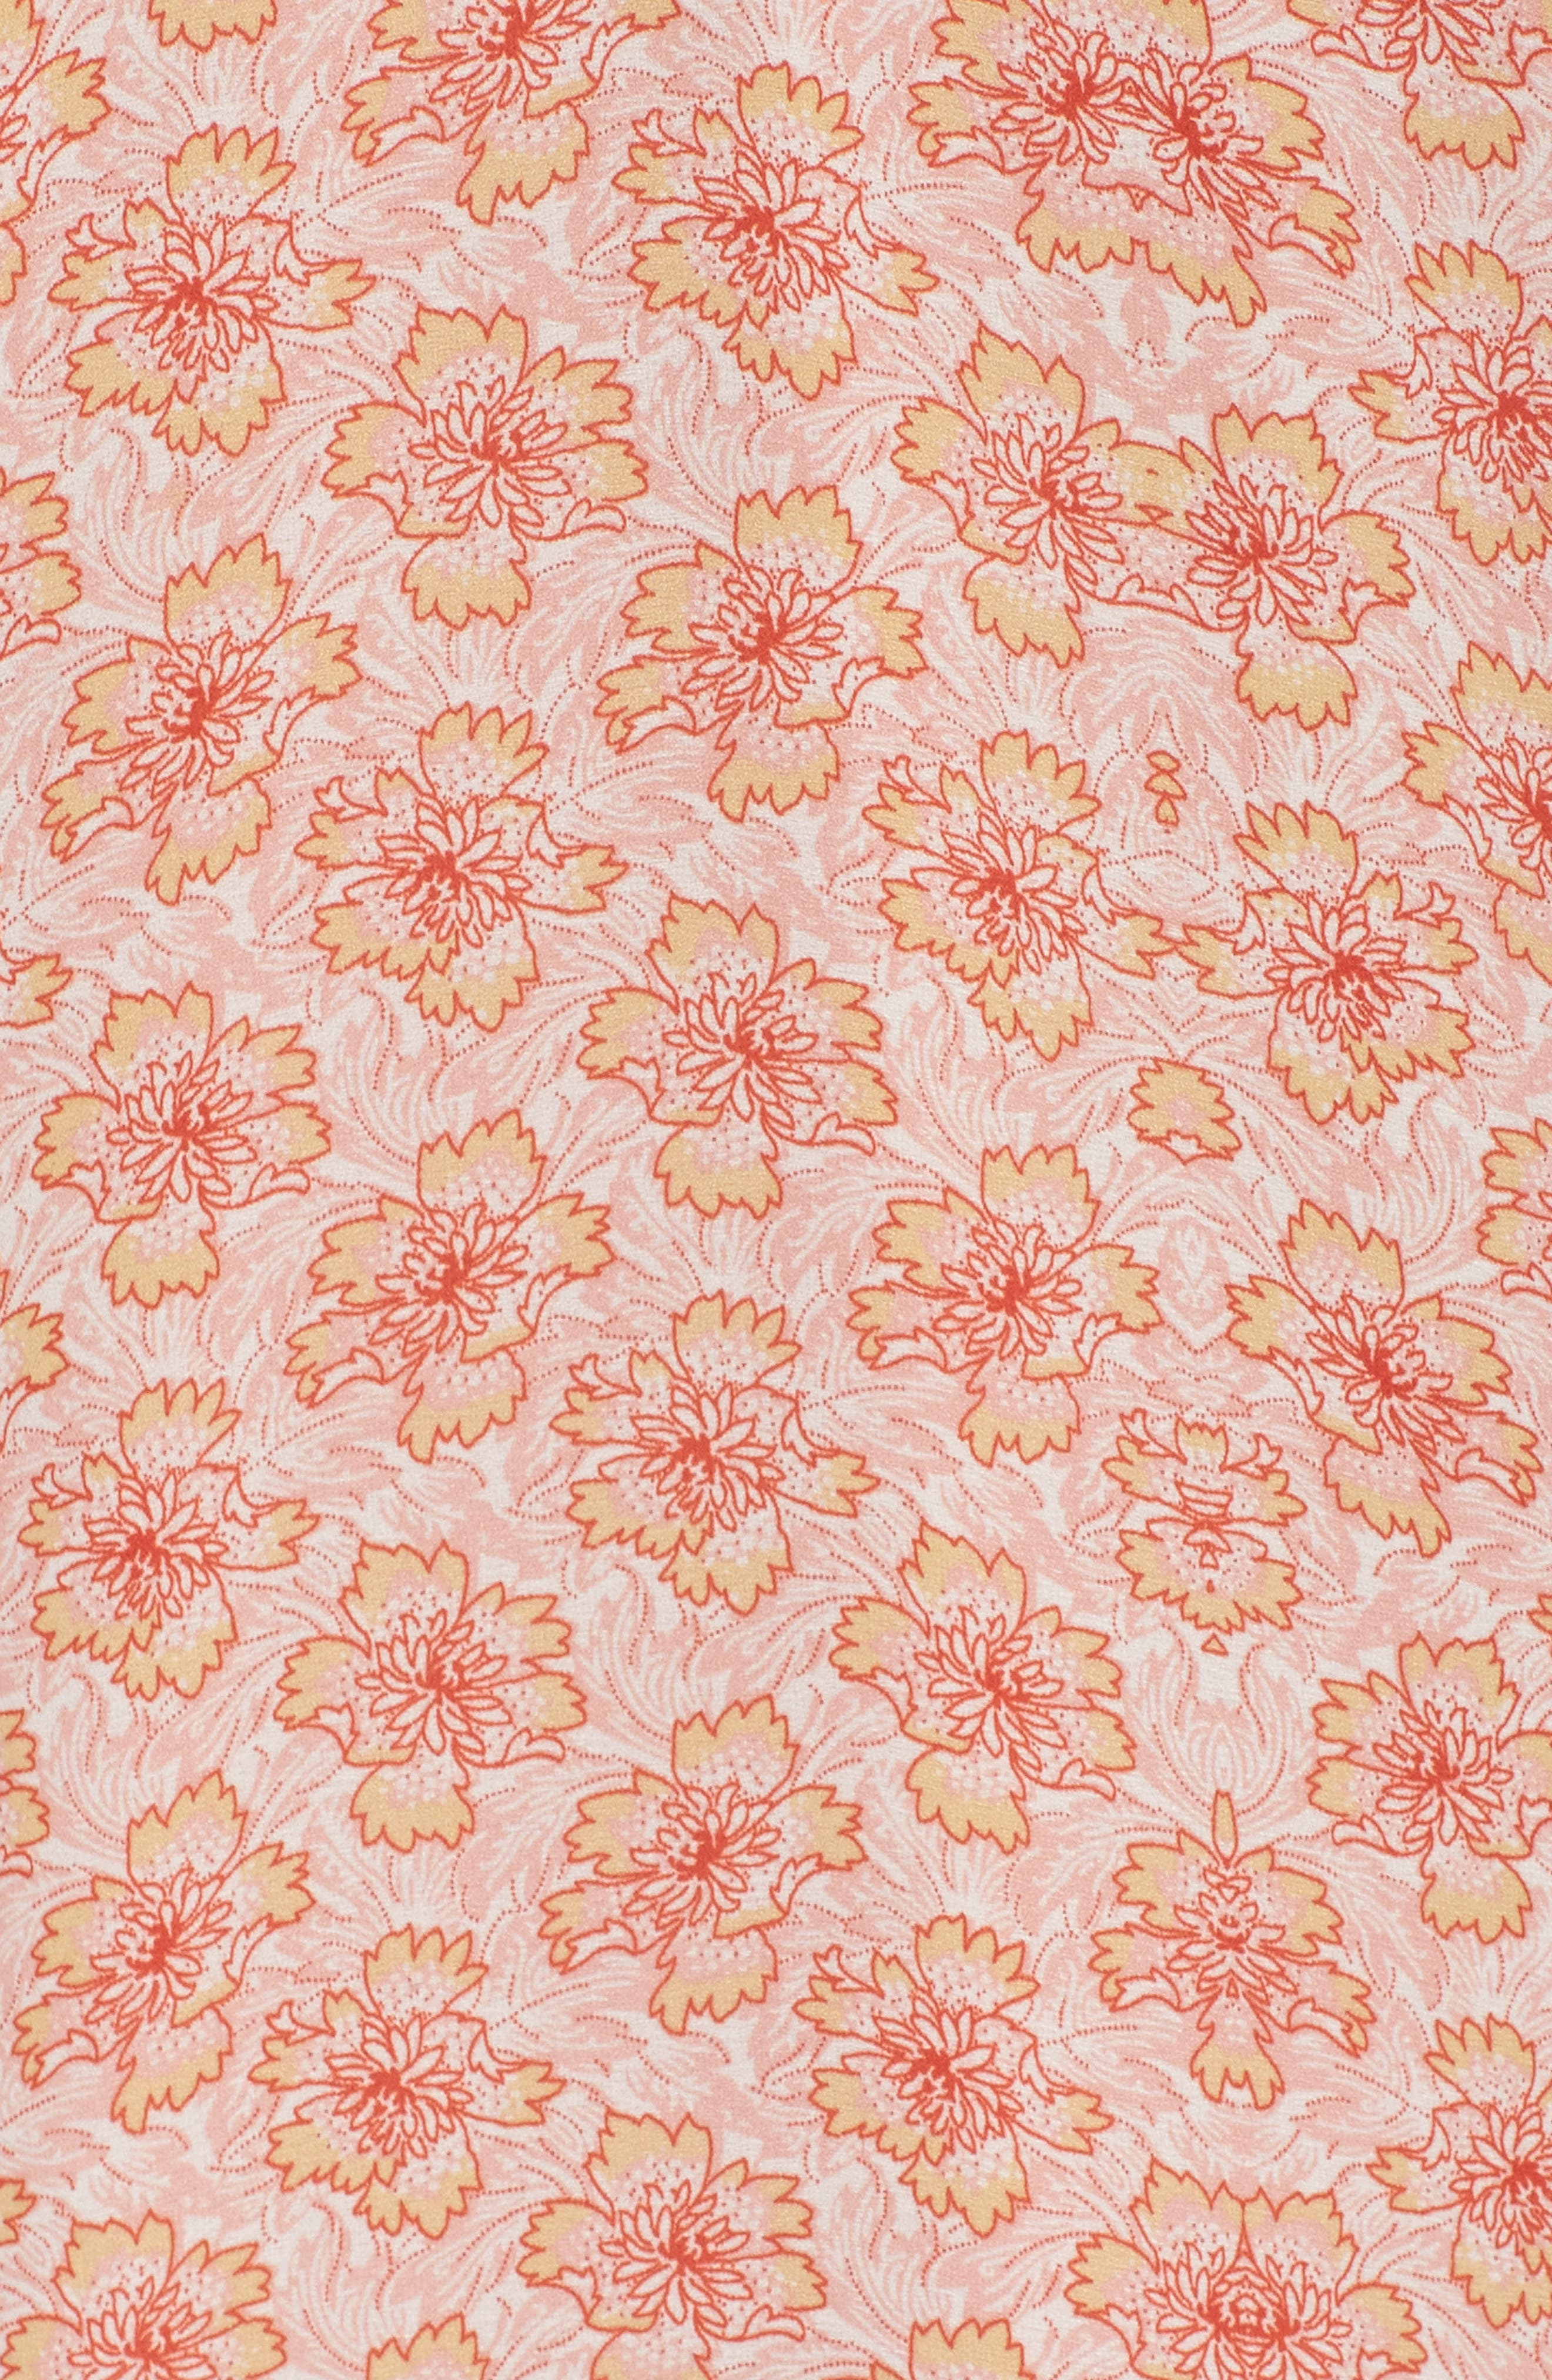 Crisscross Ruffle Shift Dress,                             Alternate thumbnail 6, color,                             653